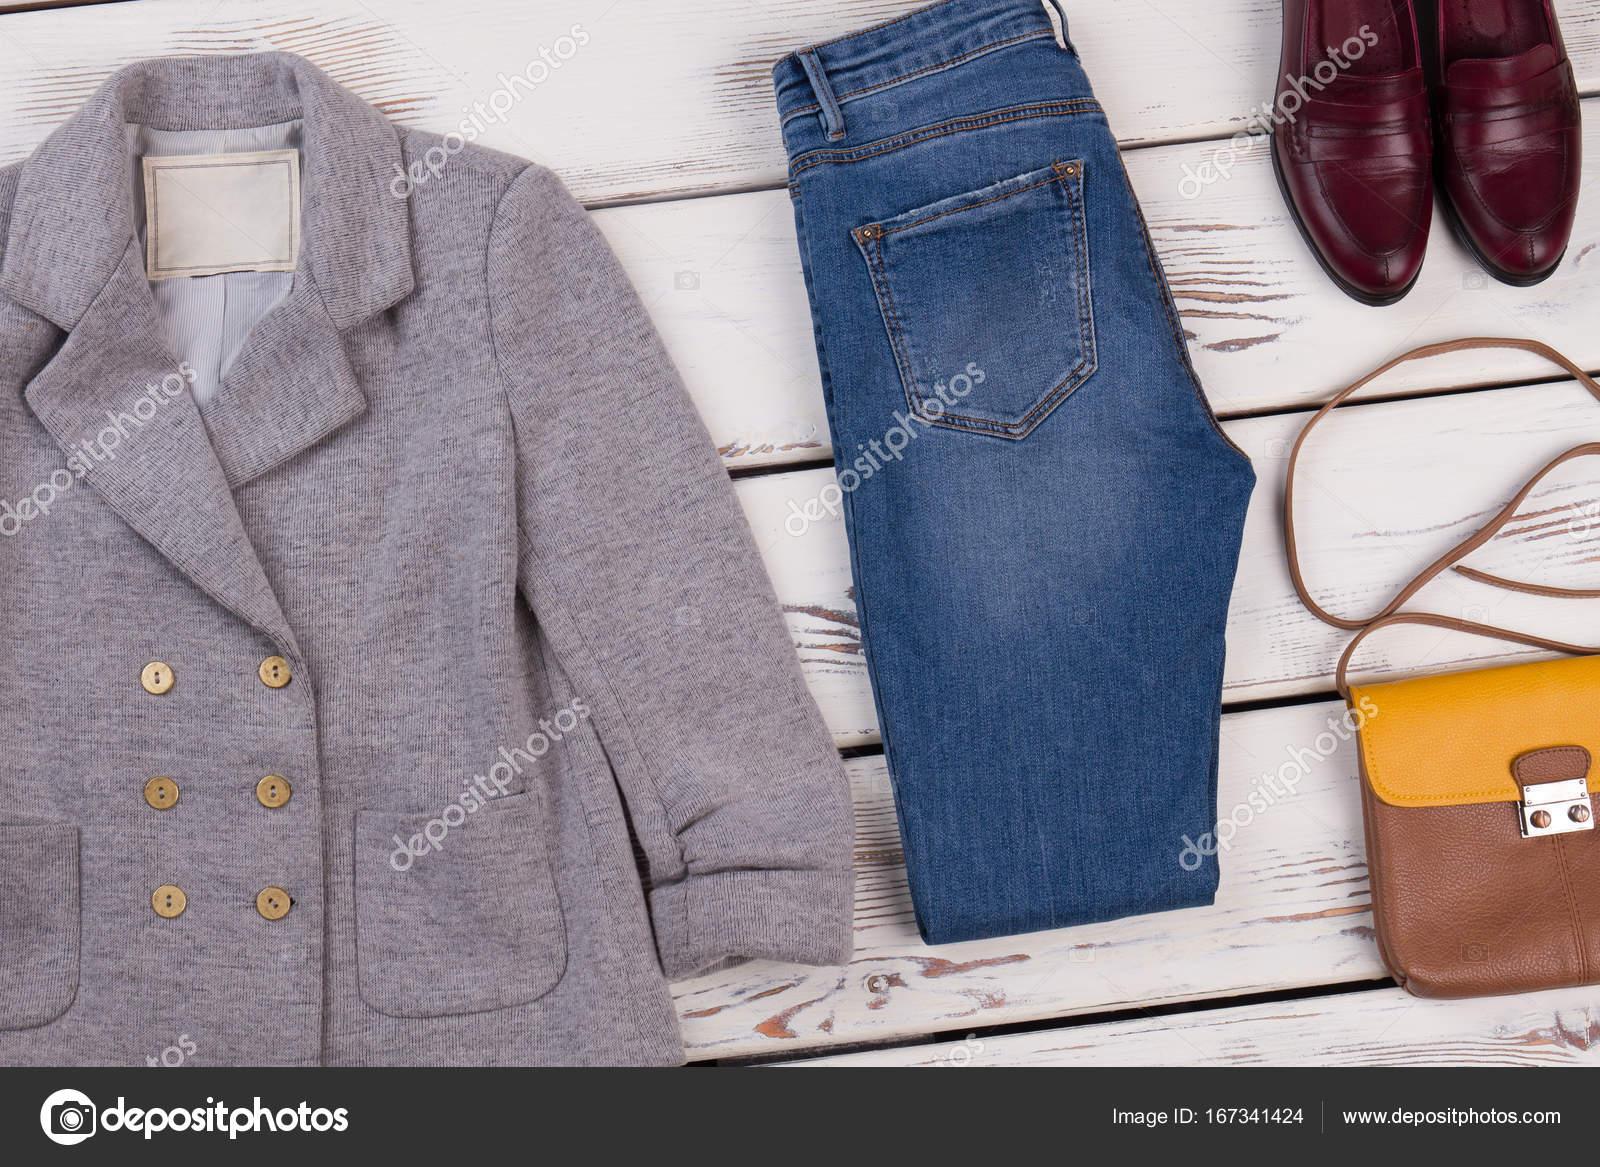 d8d3872093 ... Φωτογραφία Αρχείου · Γυναικεία σακάκι και skinny τζιν σε συνδυασμό με  δερμάτινα παπούτσια και τσάντα ώμου. Σετ ρούχα γνωστών σχεδιαστών